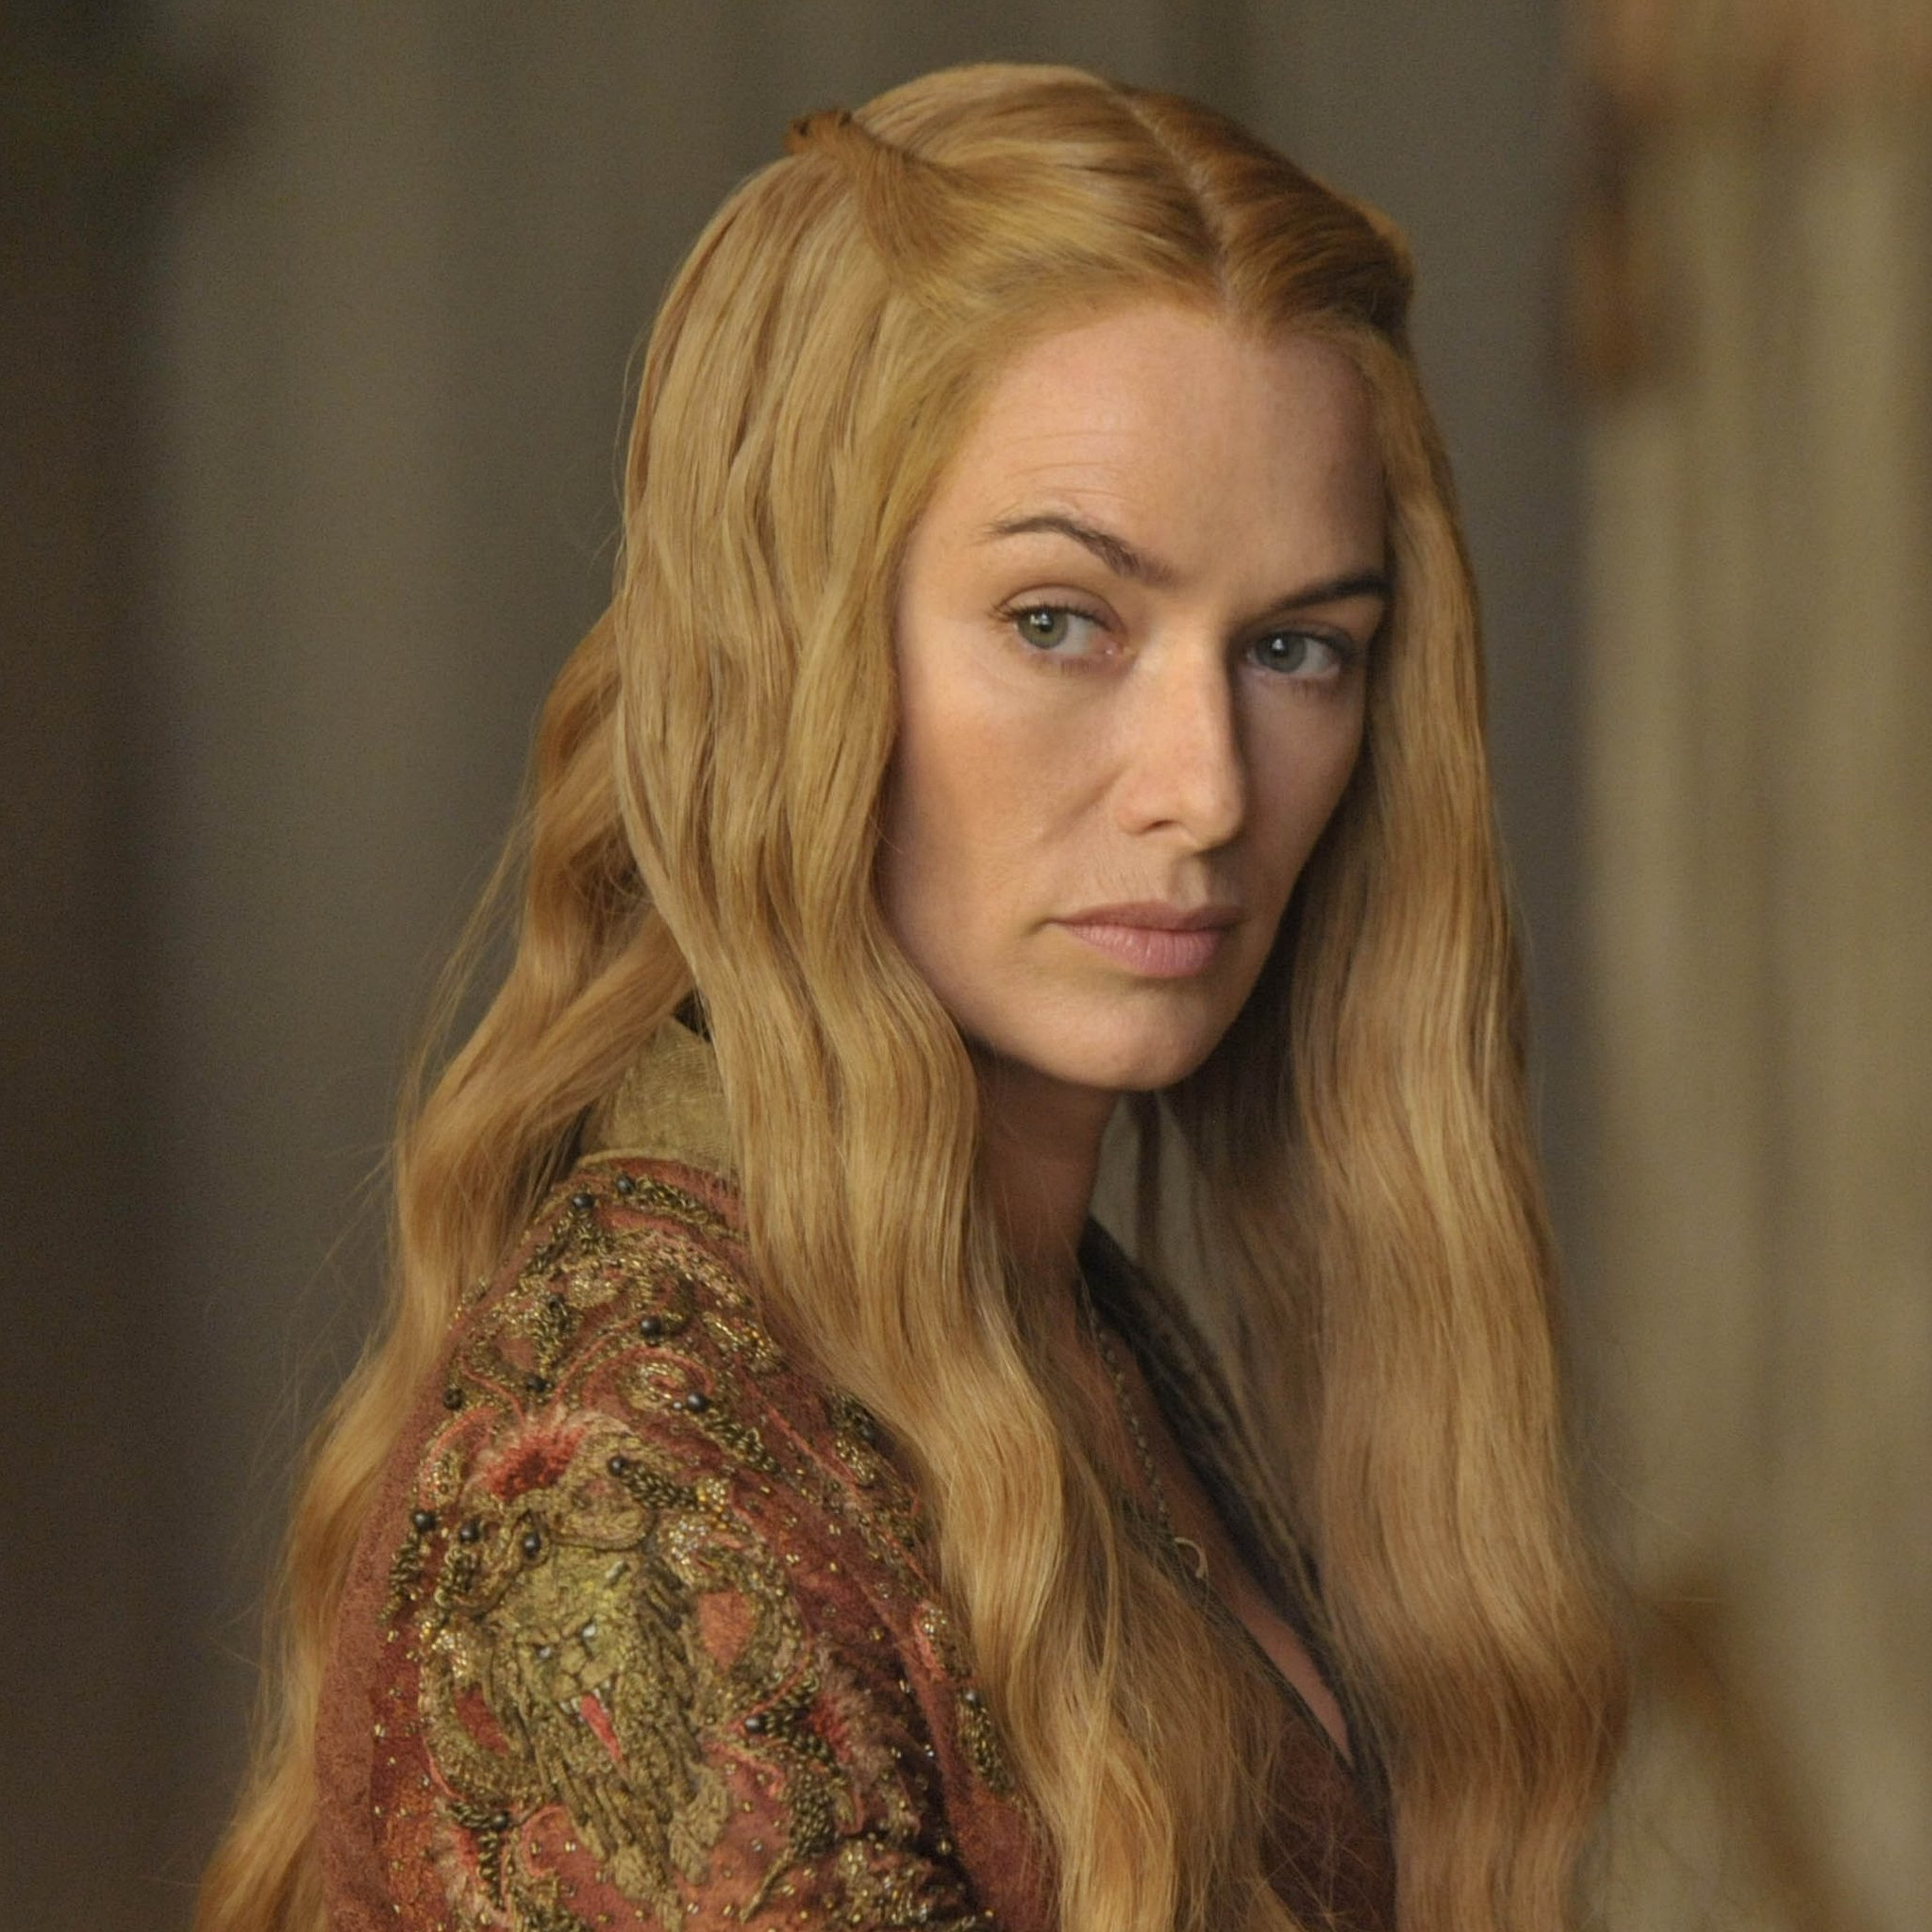 Cersey